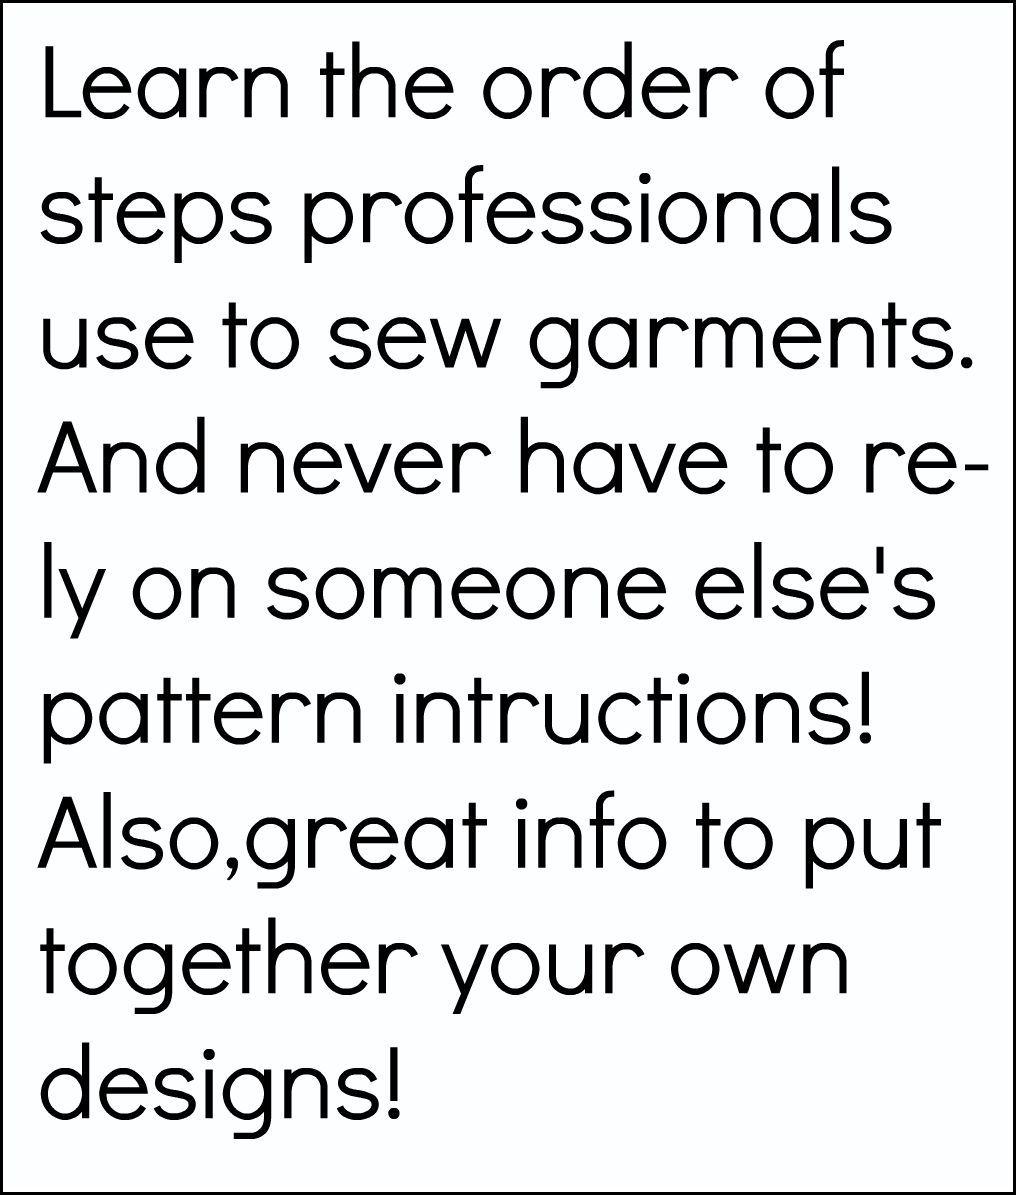 Order of garment construction.